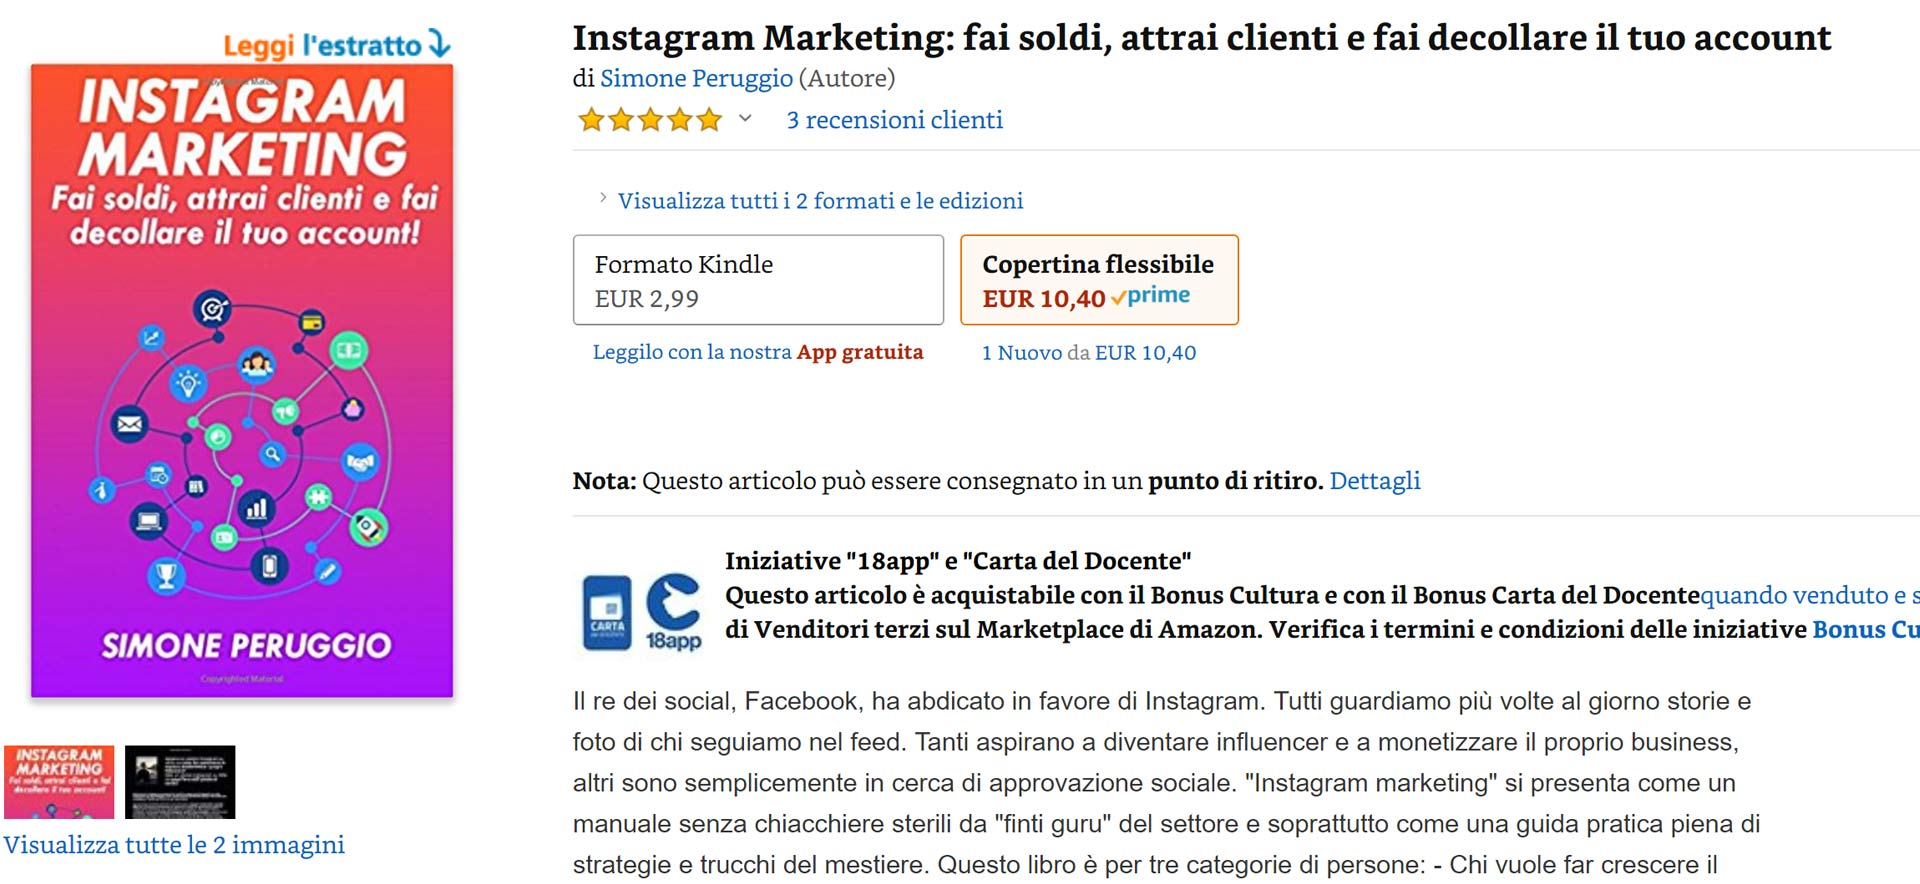 migliori hashtag instagram libro